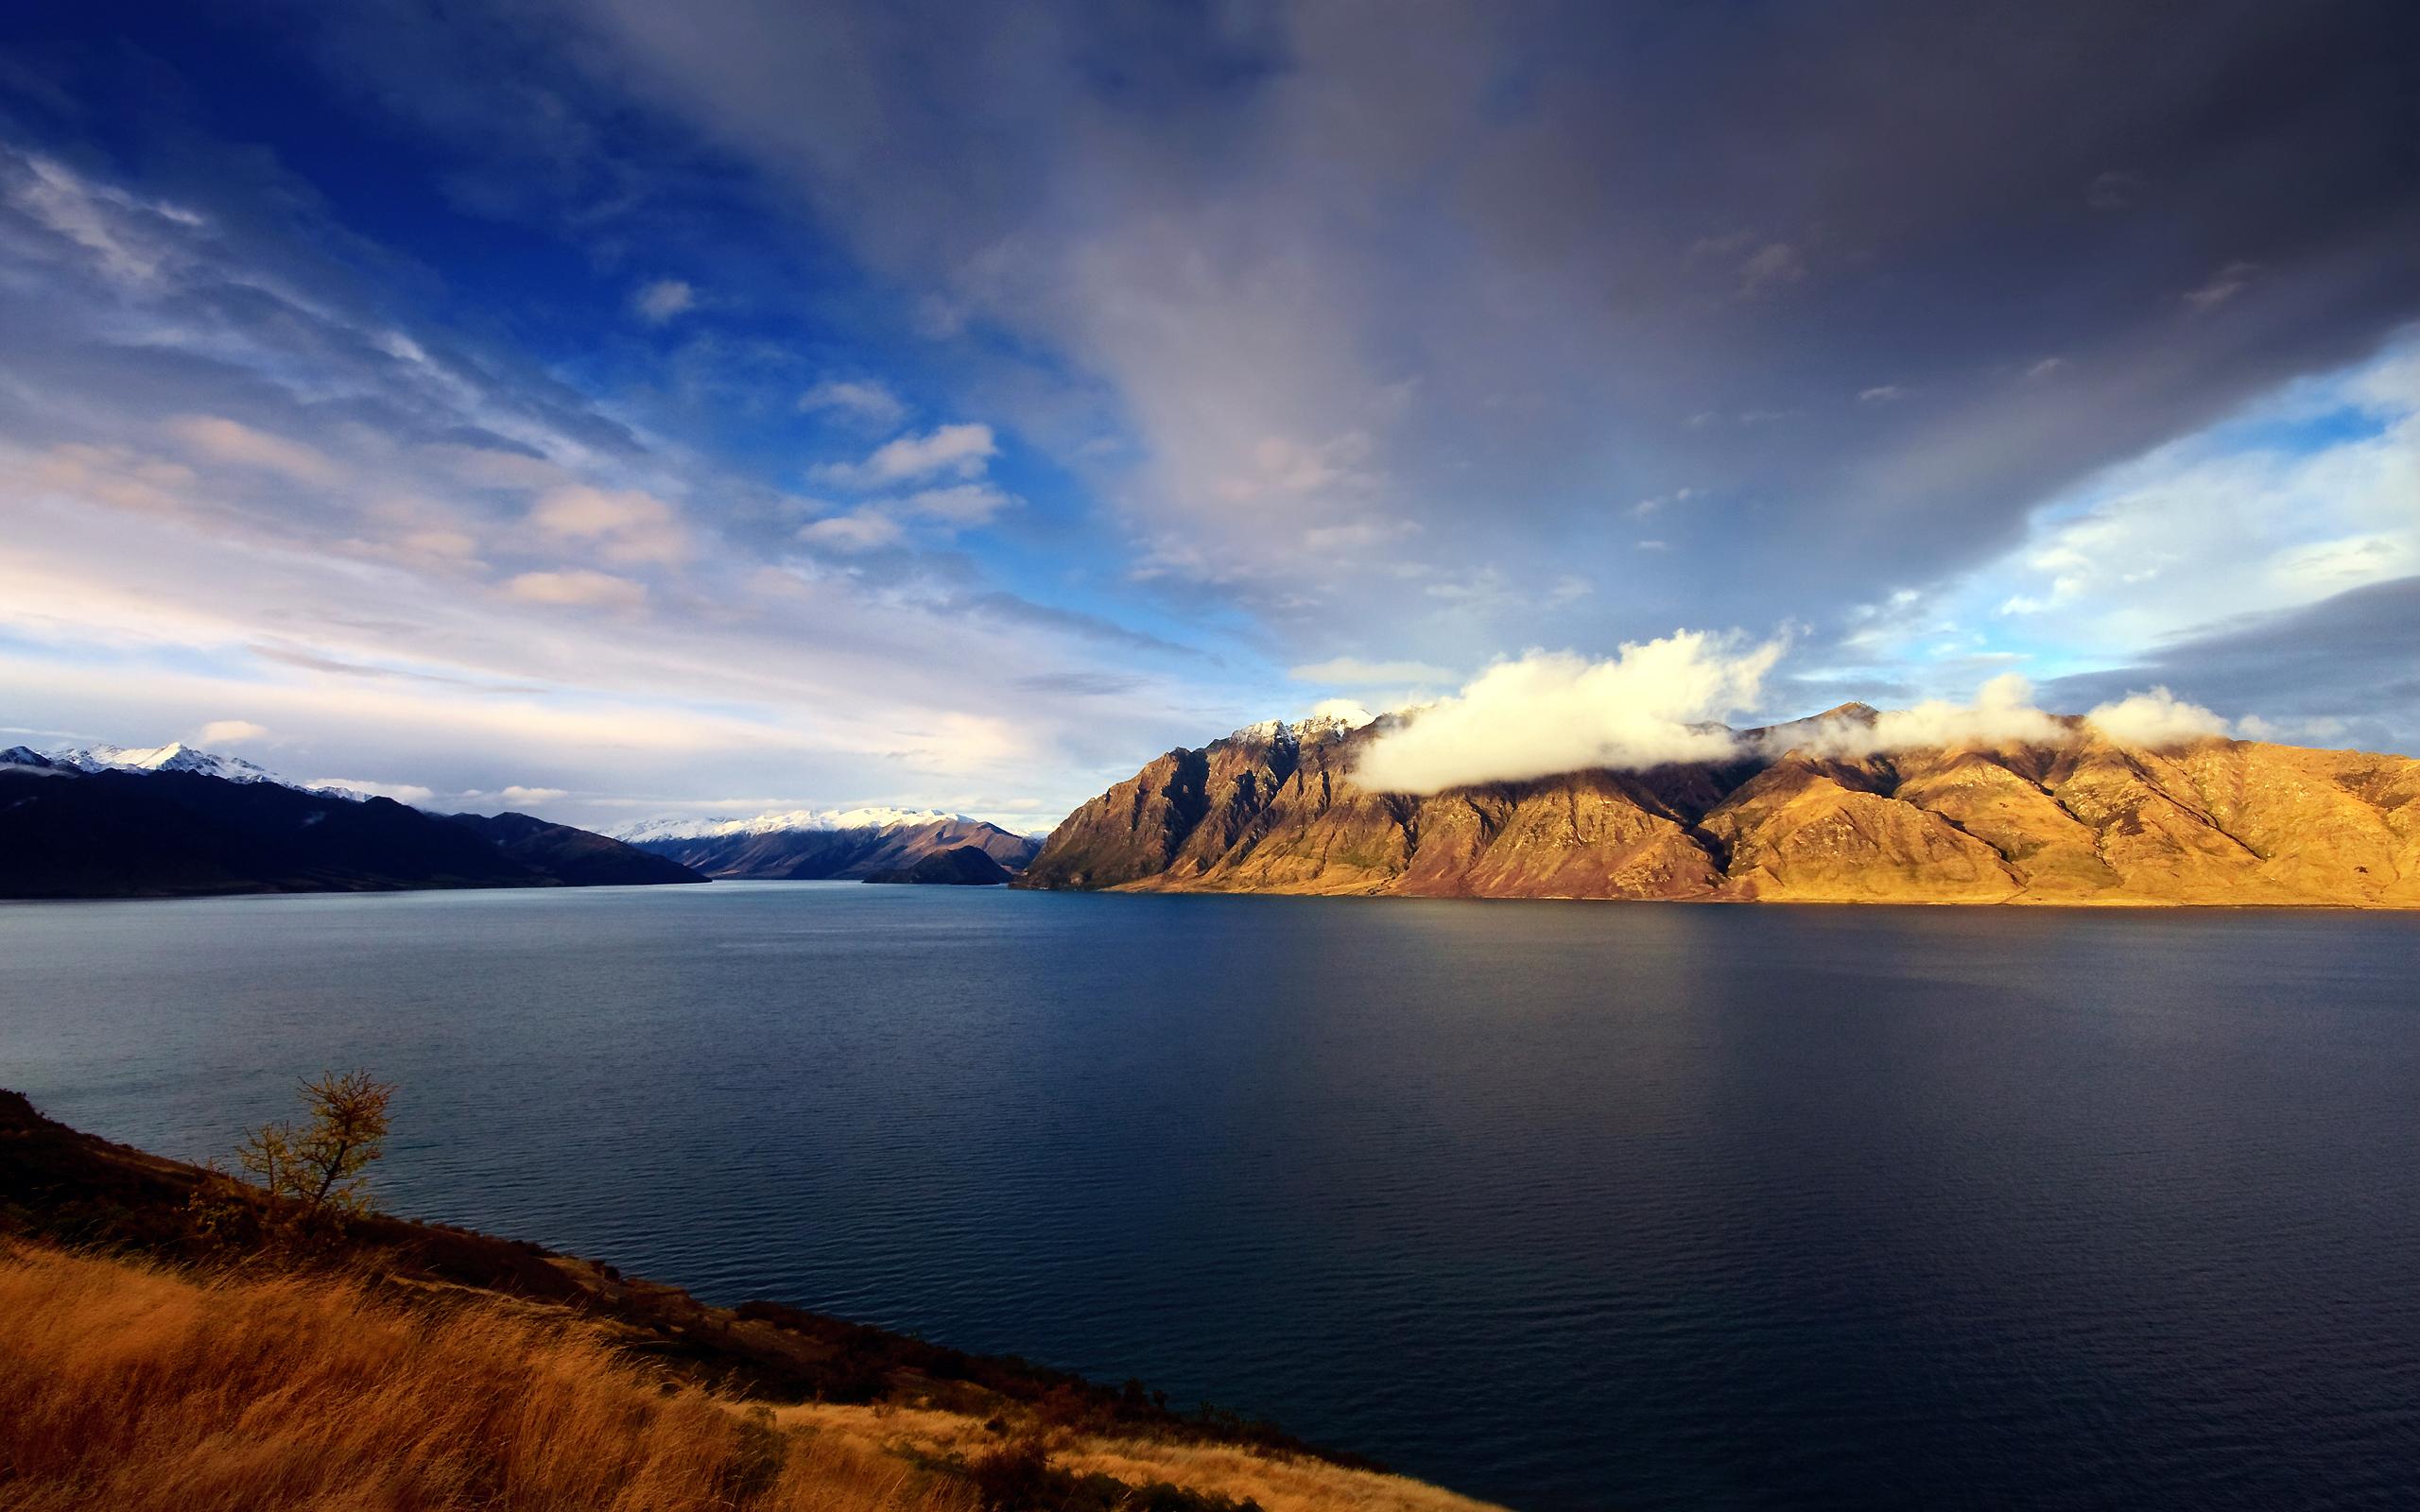 Lake Hawea New Zealand Wallpapers HD Wallpapers 2560x1600